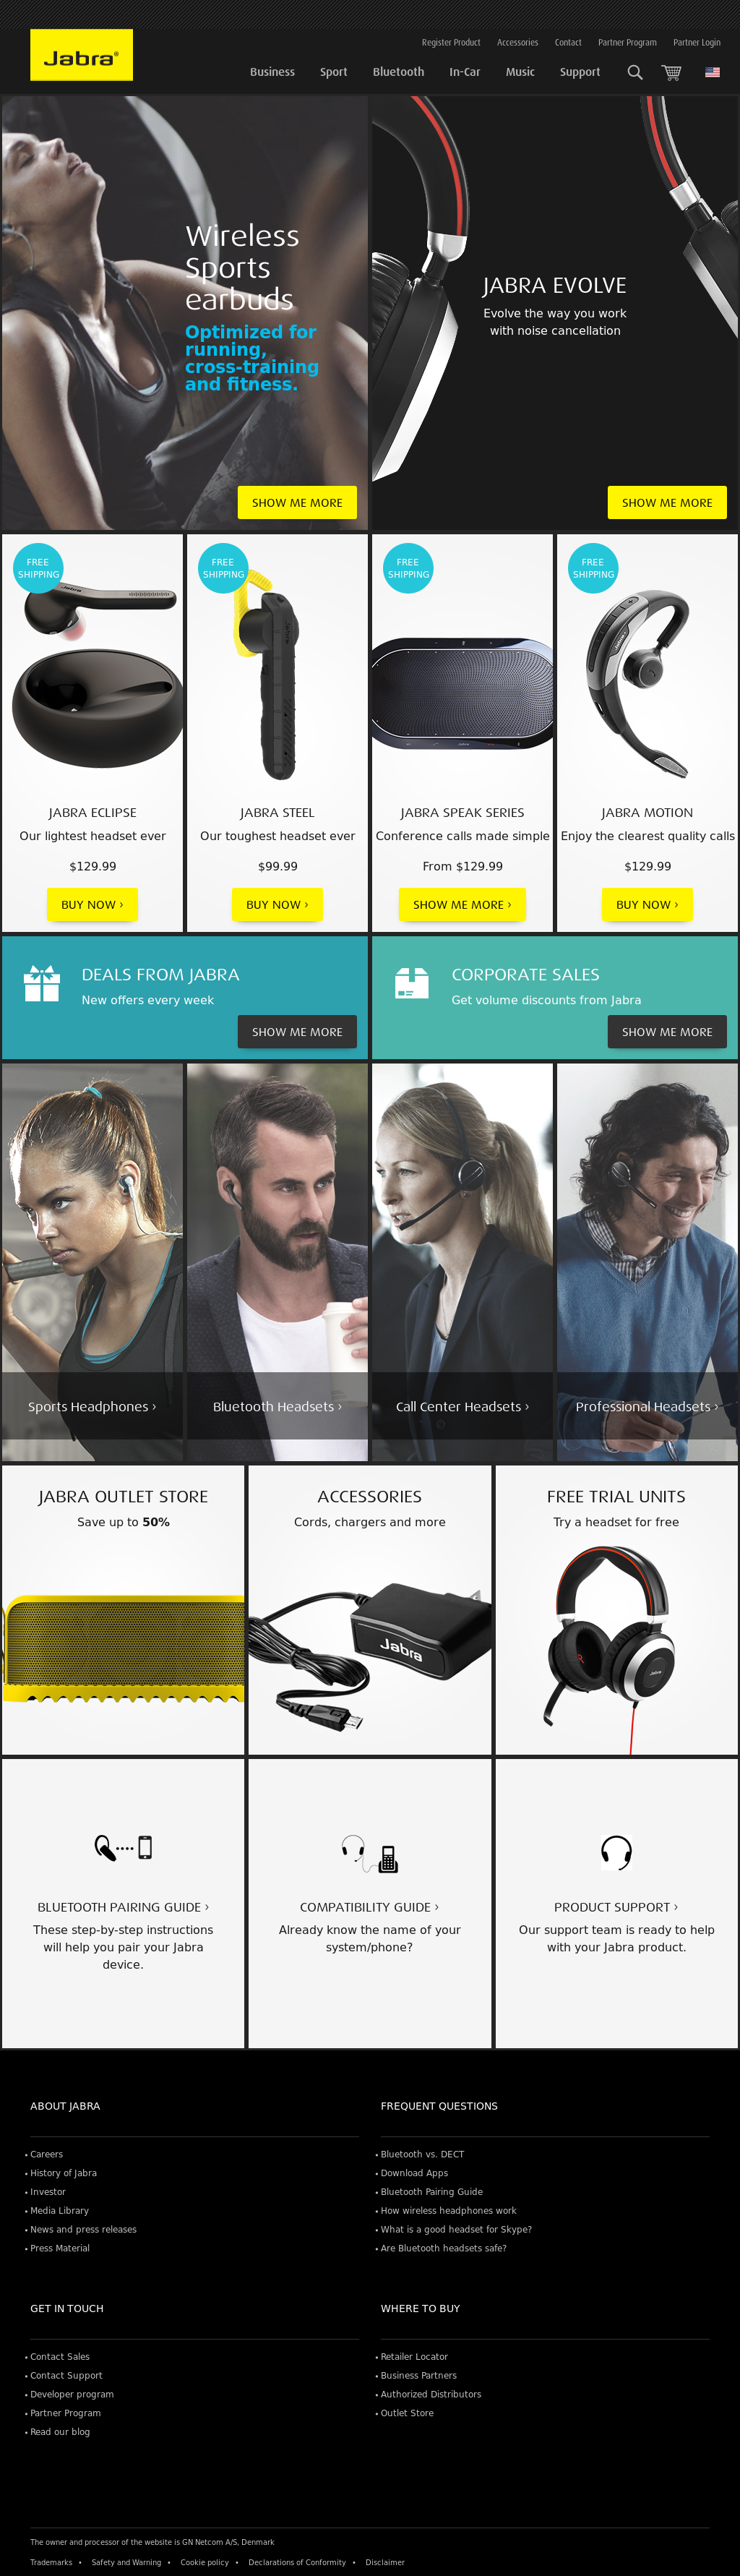 b32b5507b77 JABRA Competitors, Revenue and Employees - Owler Company Profile